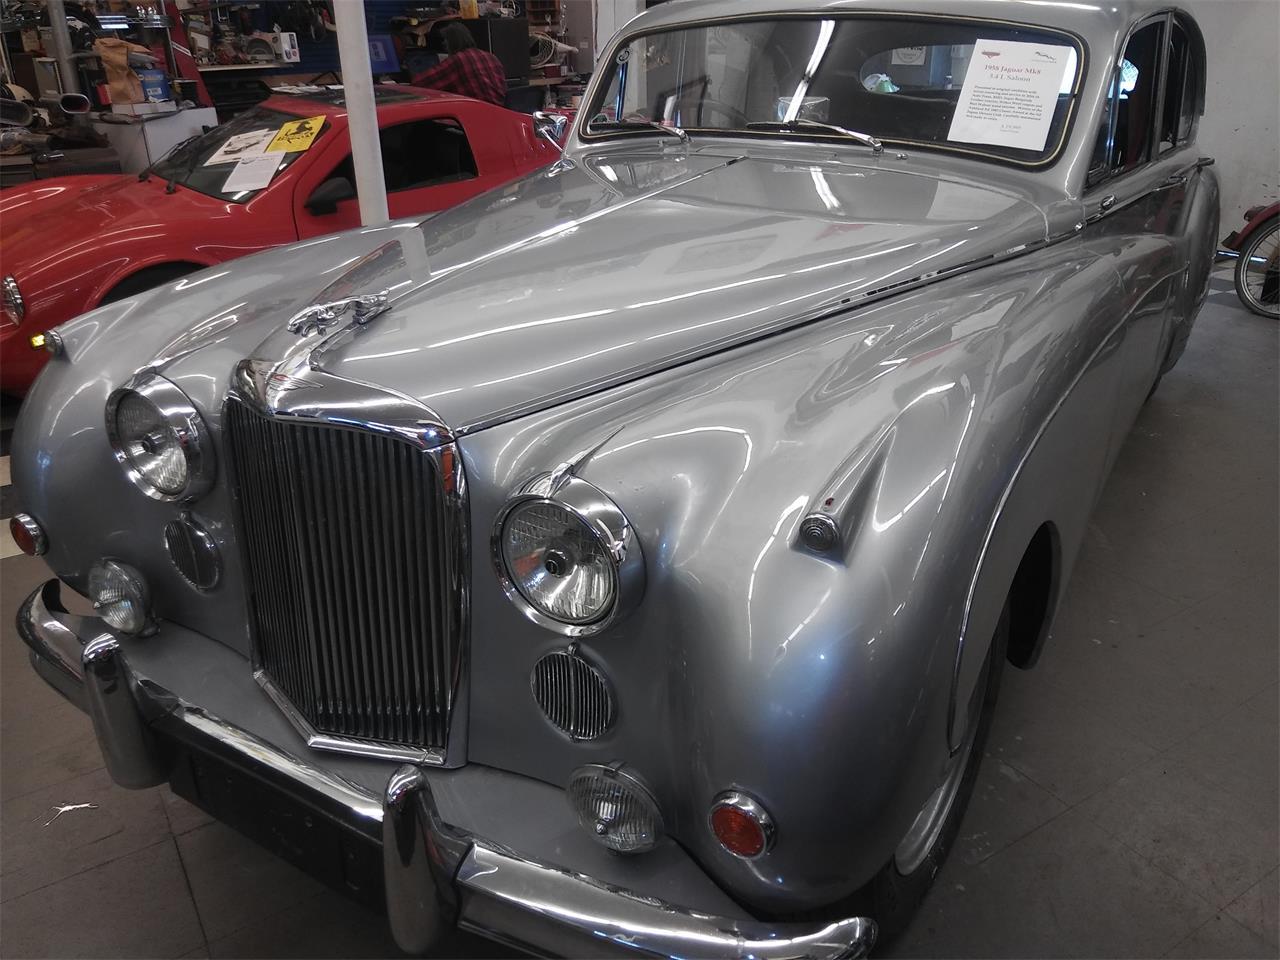 1958 Jaguar Mark VIII for Sale | ClassicCars.com | CC-1203170